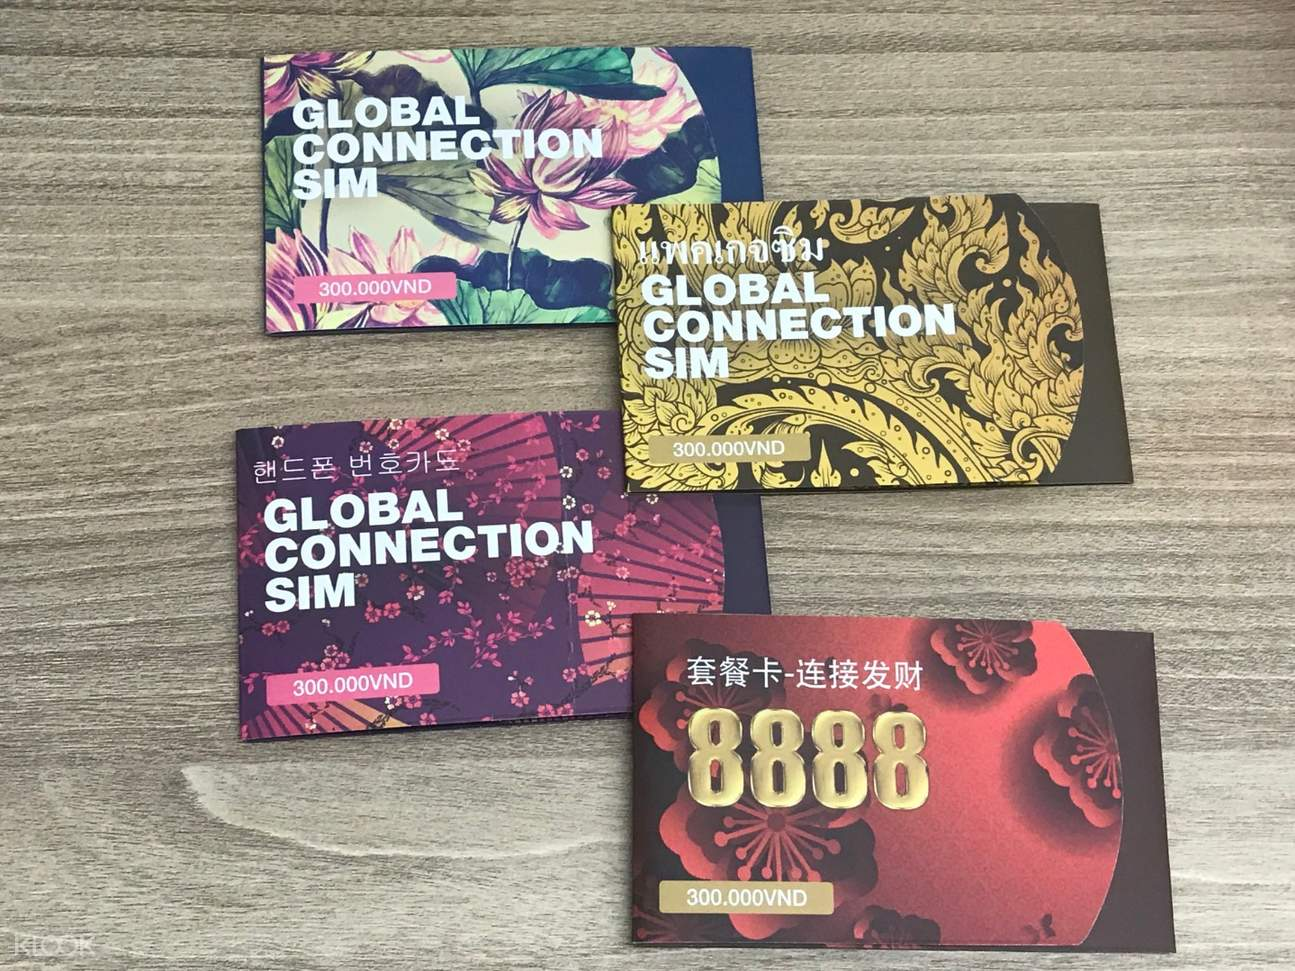 3G/4G Vinaphone SIM Card (Hanoi Hotel Delivery) for Vietnam